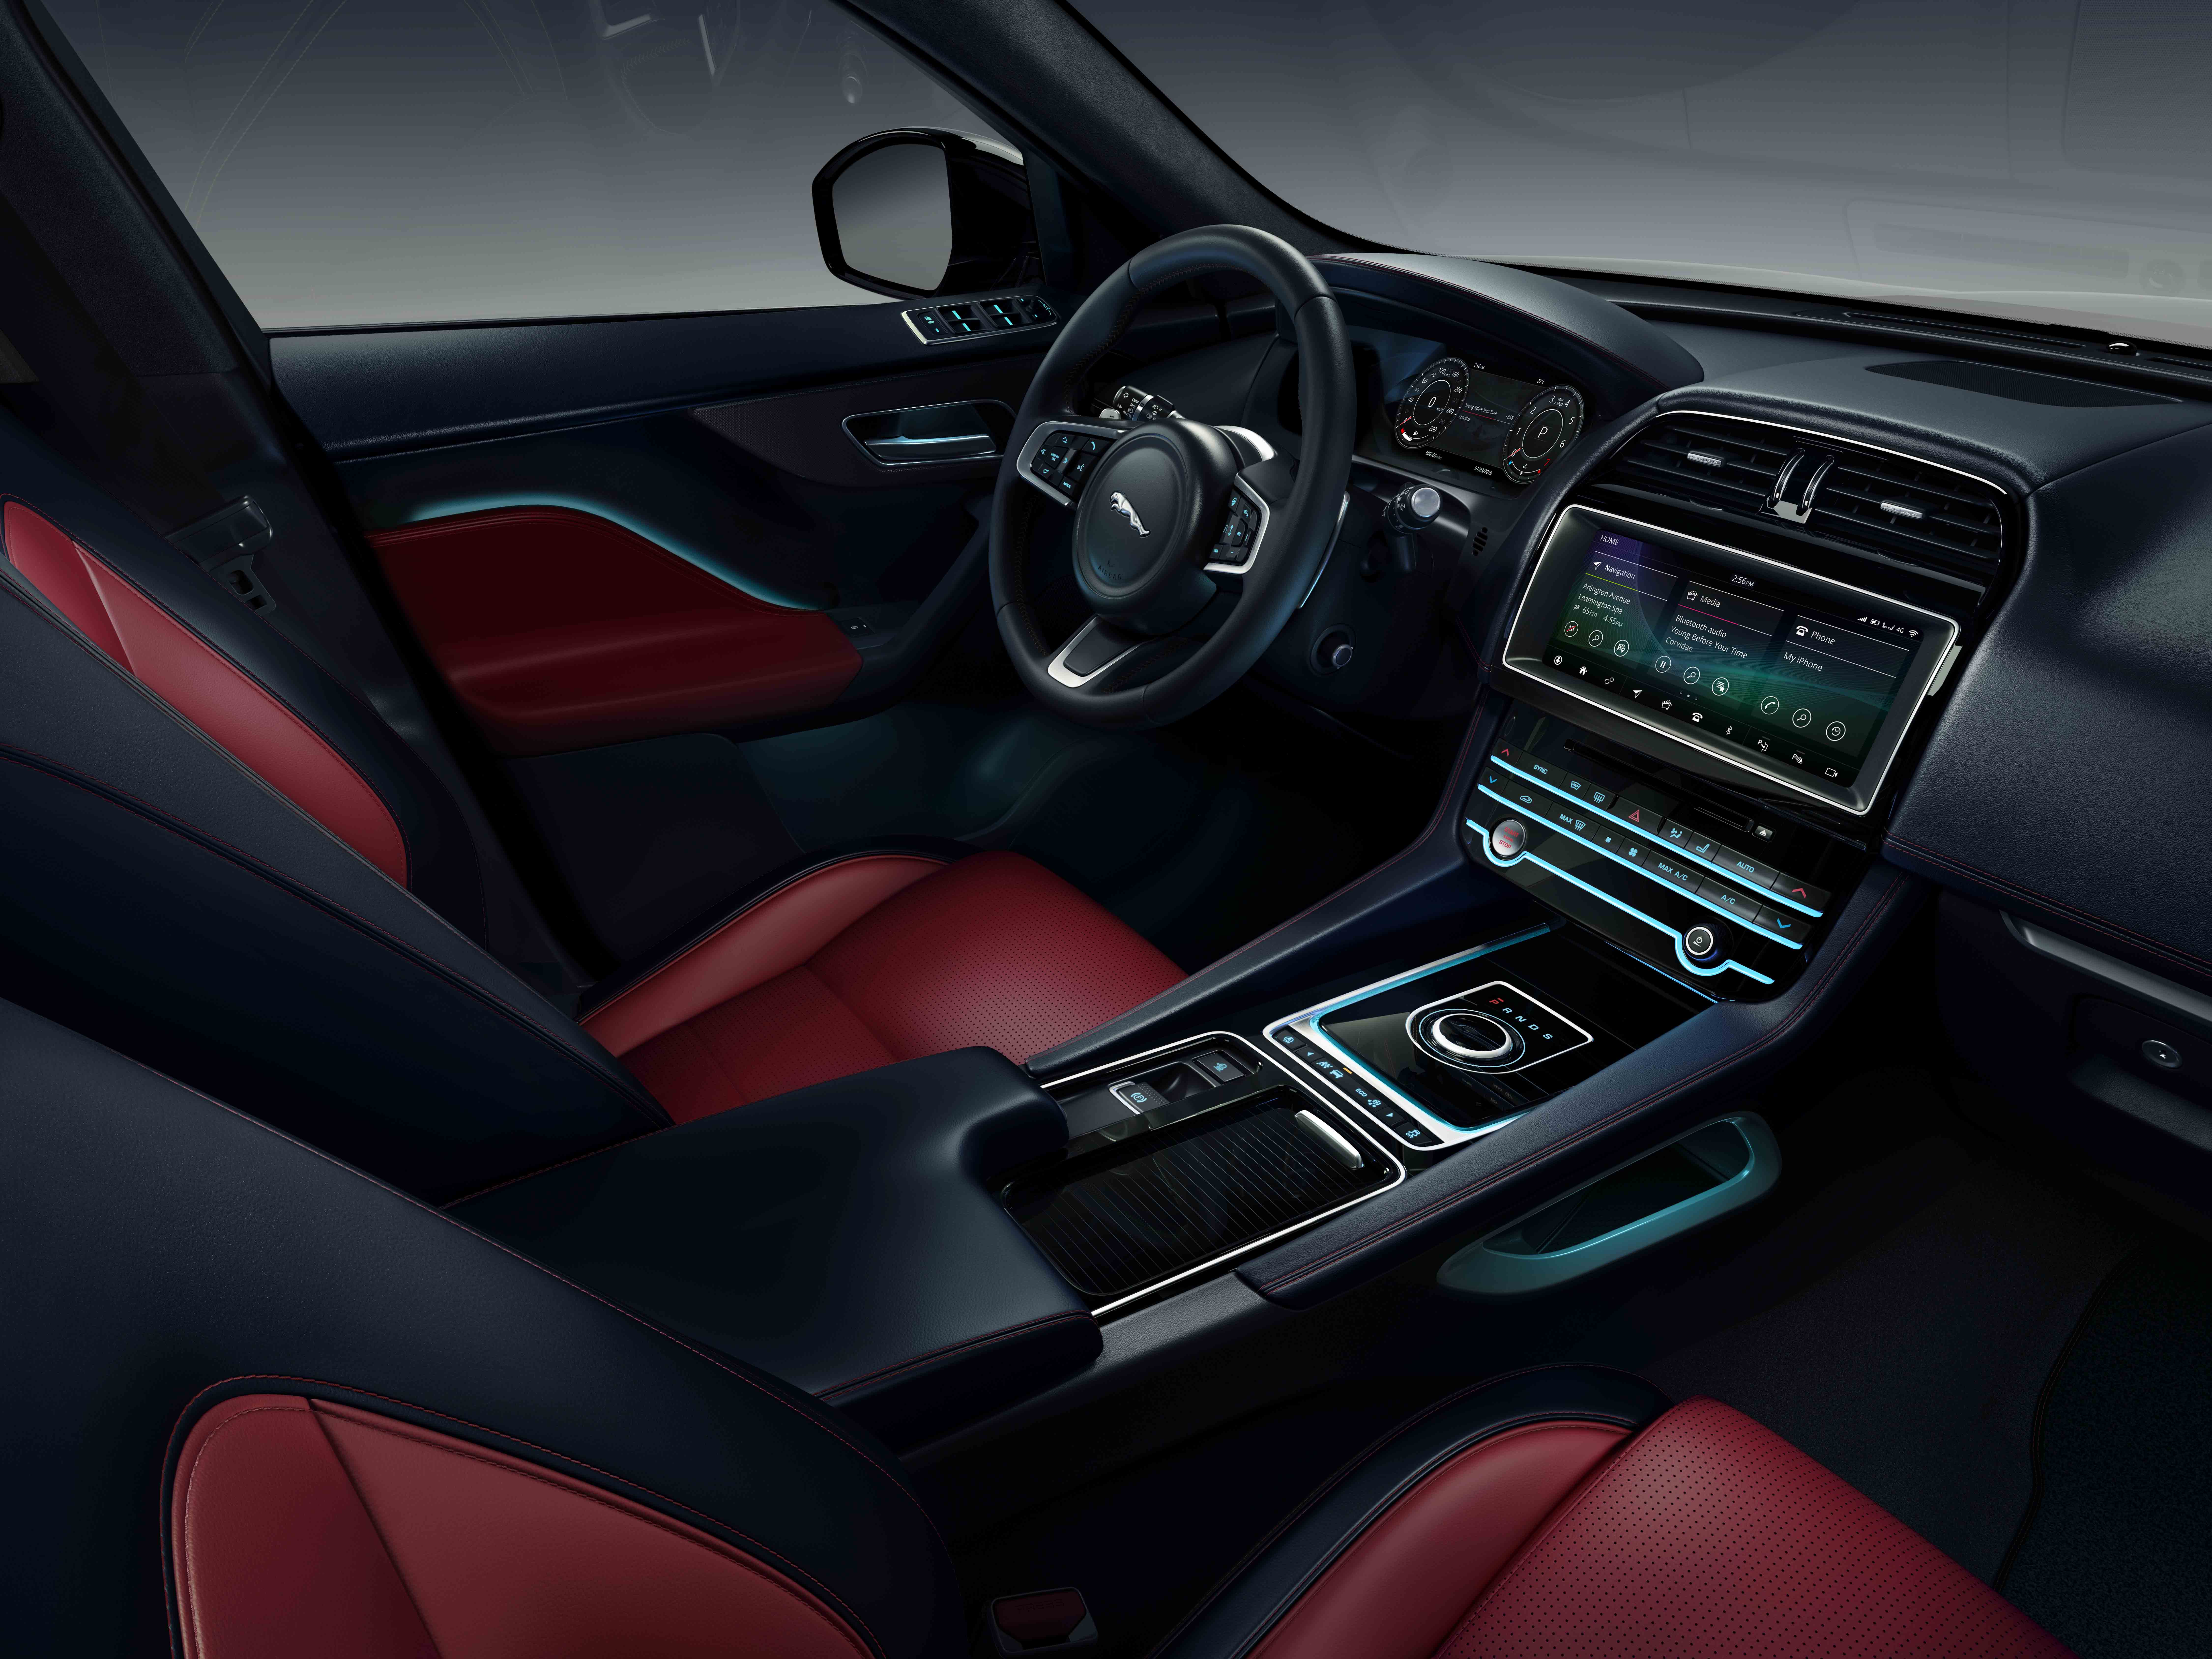 71 All New Jaguar F Pace 2020 Model Pricing for Jaguar F Pace 2020 Model